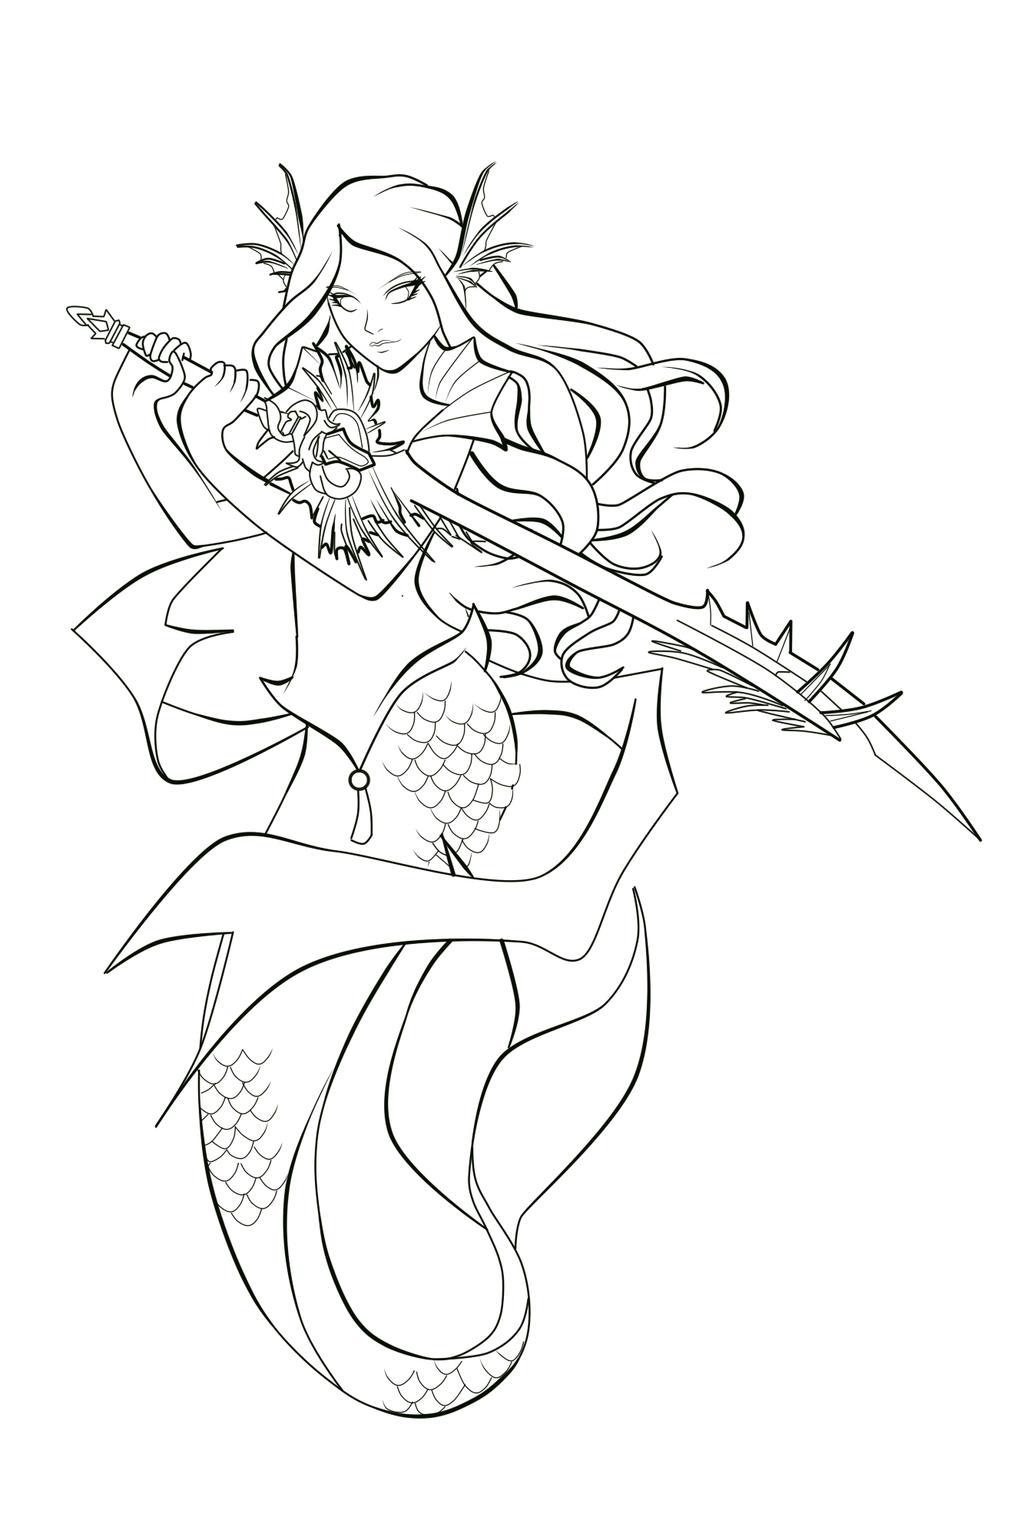 Mermaid Tattoo: PLEASE READ. by bishounenhunter on DeviantArt |Mermaid Line Drawing